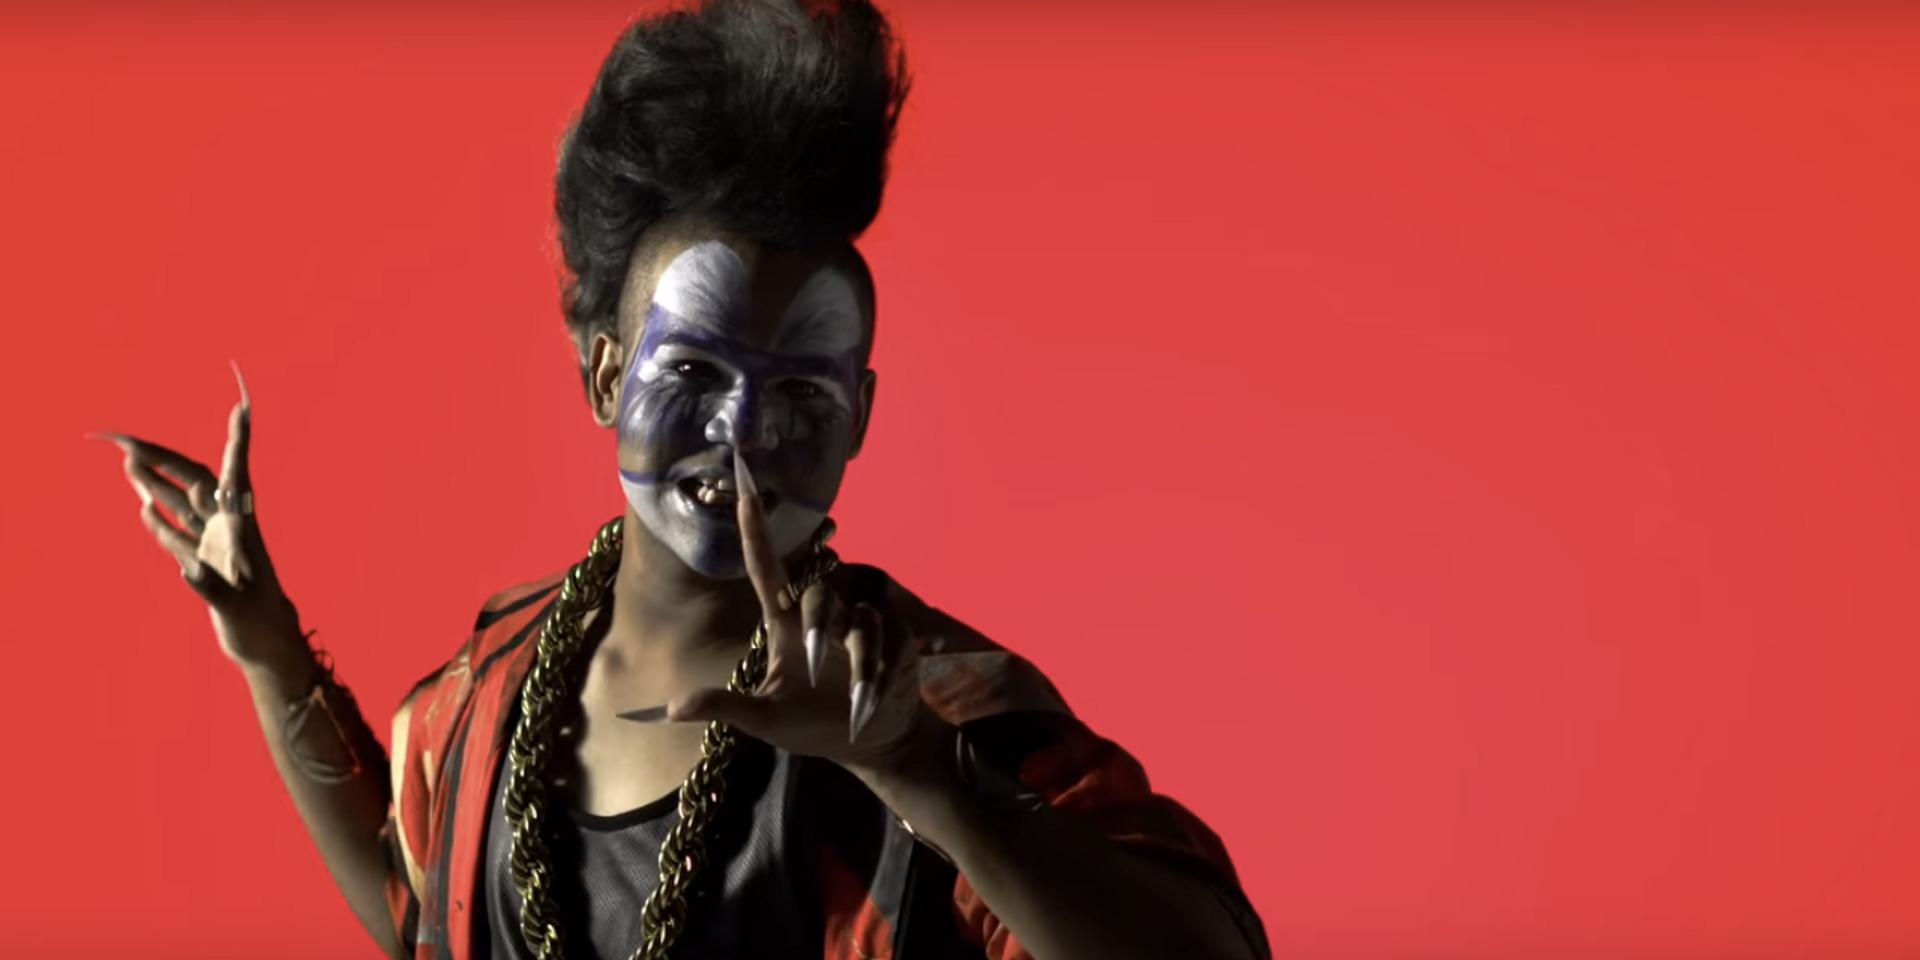 WATCH: Radio DJ Joshua Simon tackles trap pop with the glamorously gruesome 'Murda'